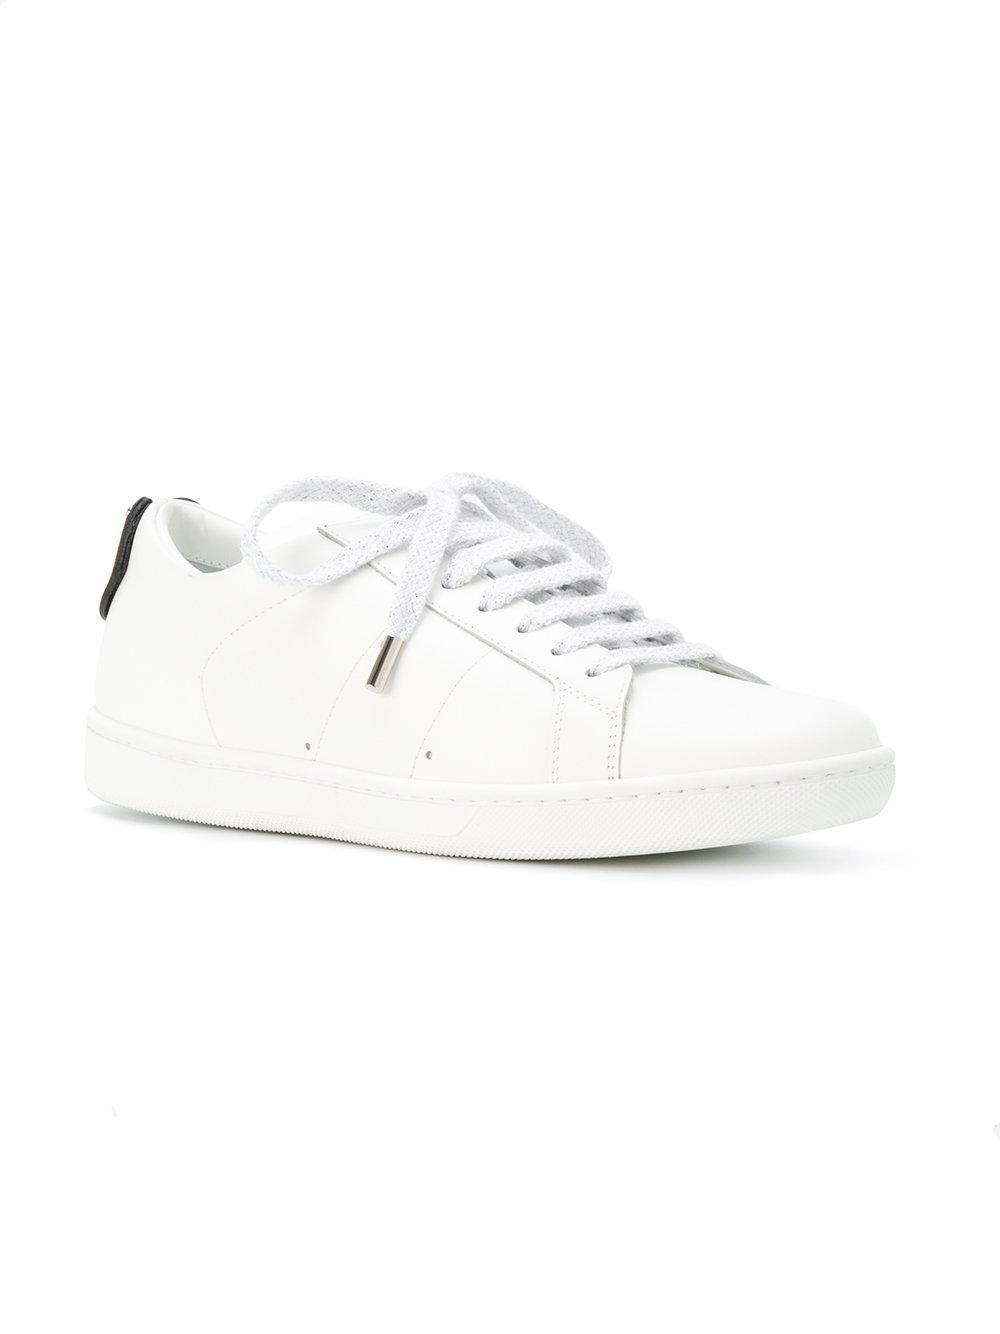 Saint Laurent White & Gold Court Classic SL/01 Lips Sneakers dnBCLok